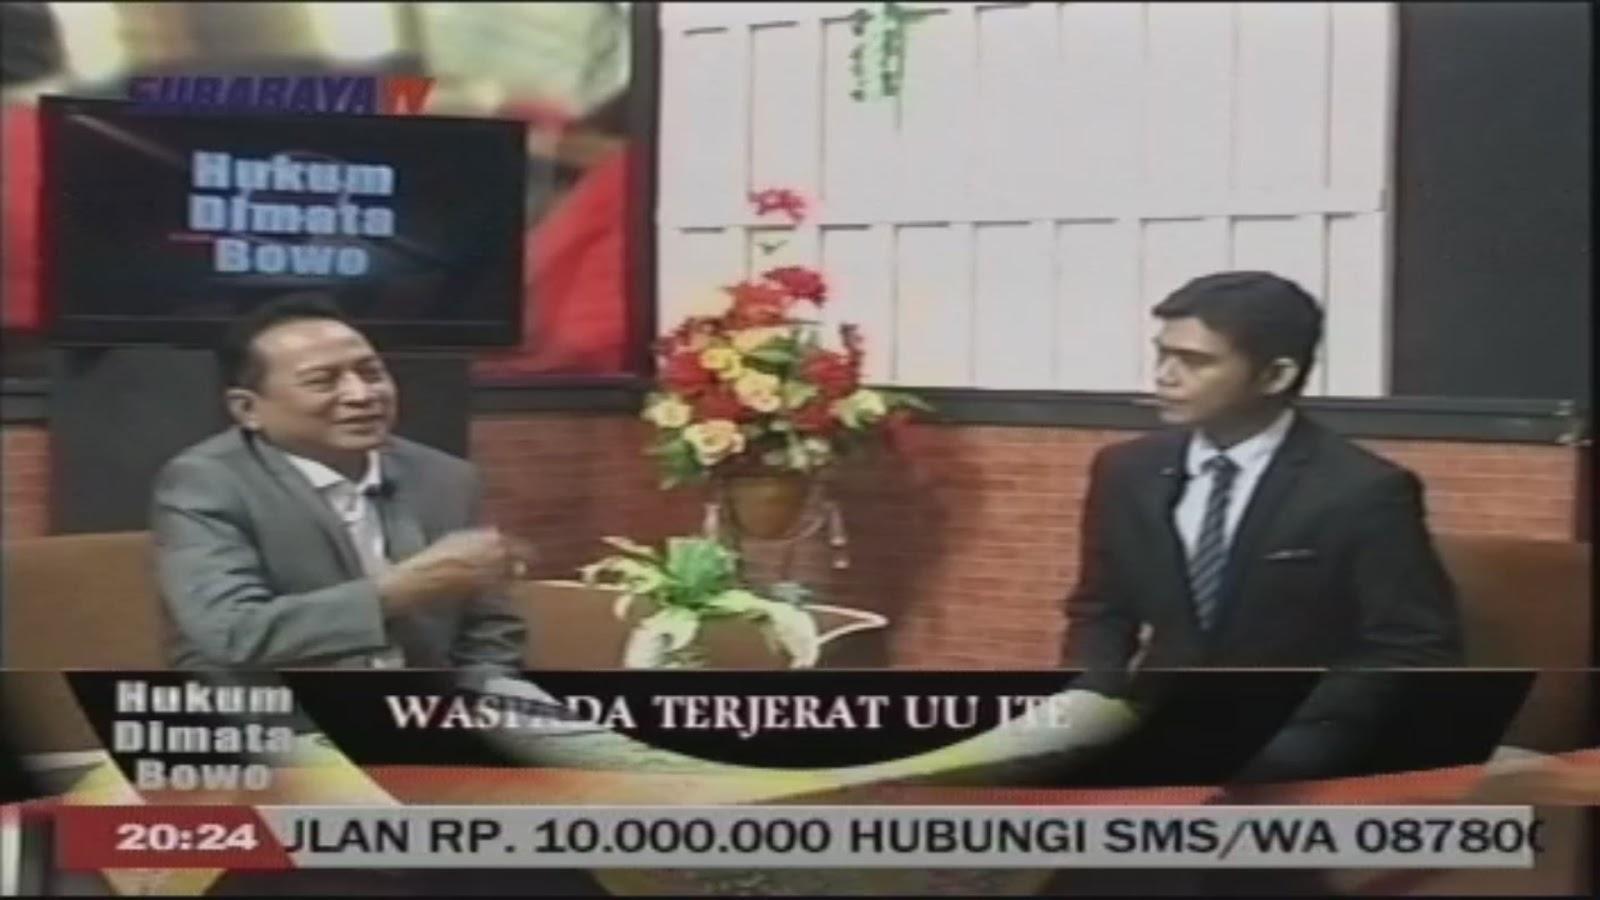 Frekuensi siaran Surabaya TV / Jogja TV / Semarang TV di satelit Palapa D Terbaru